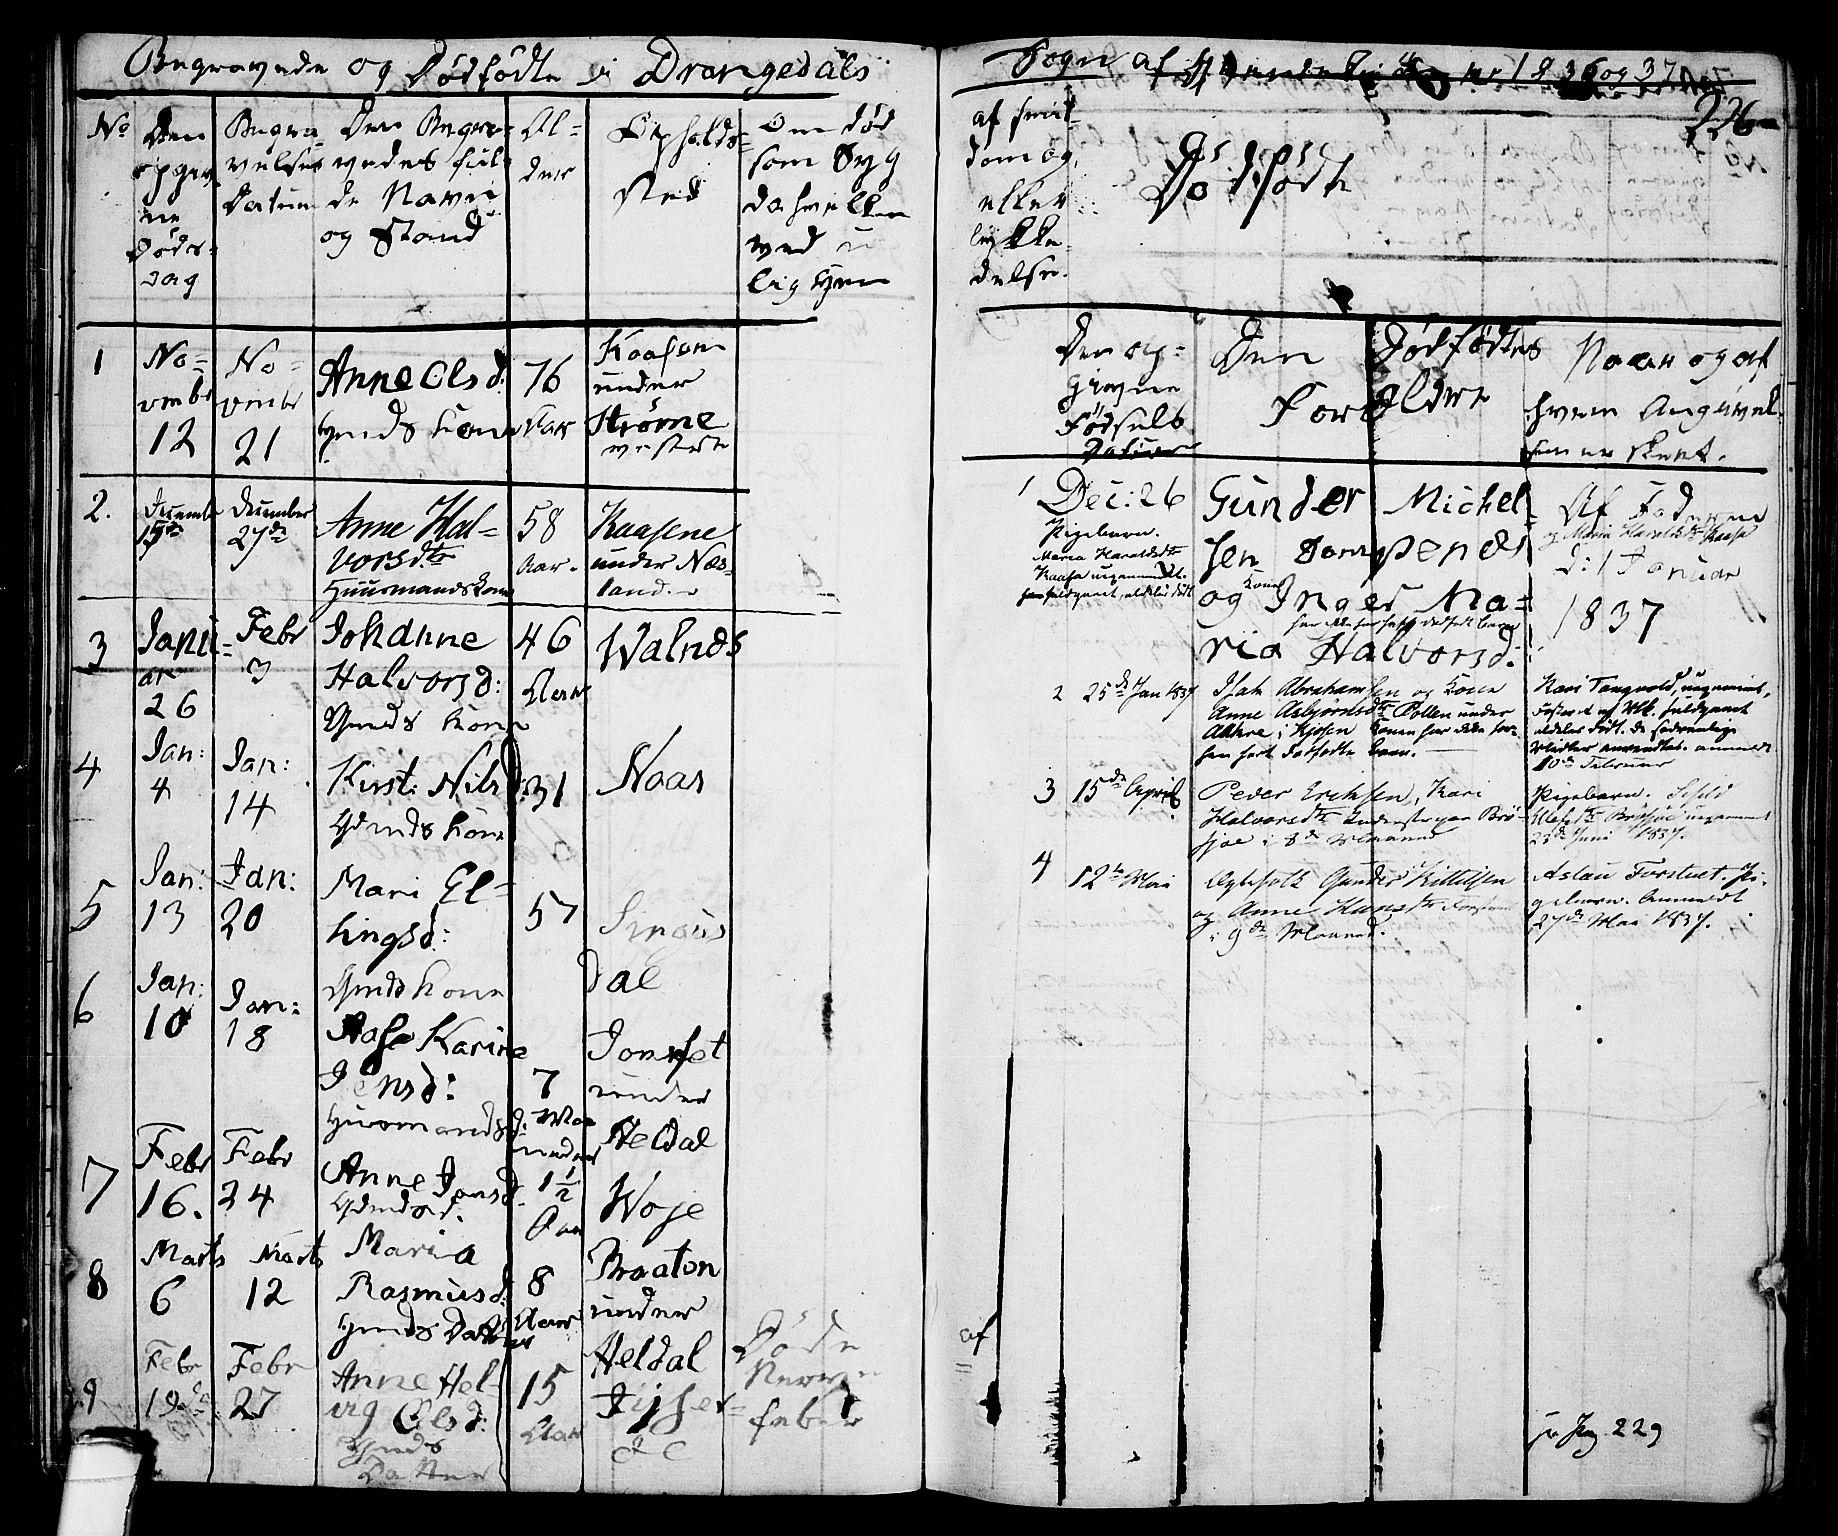 SAKO, Drangedal kirkebøker, F/Fa/L0006: Ministerialbok nr. 6, 1831-1837, s. 226